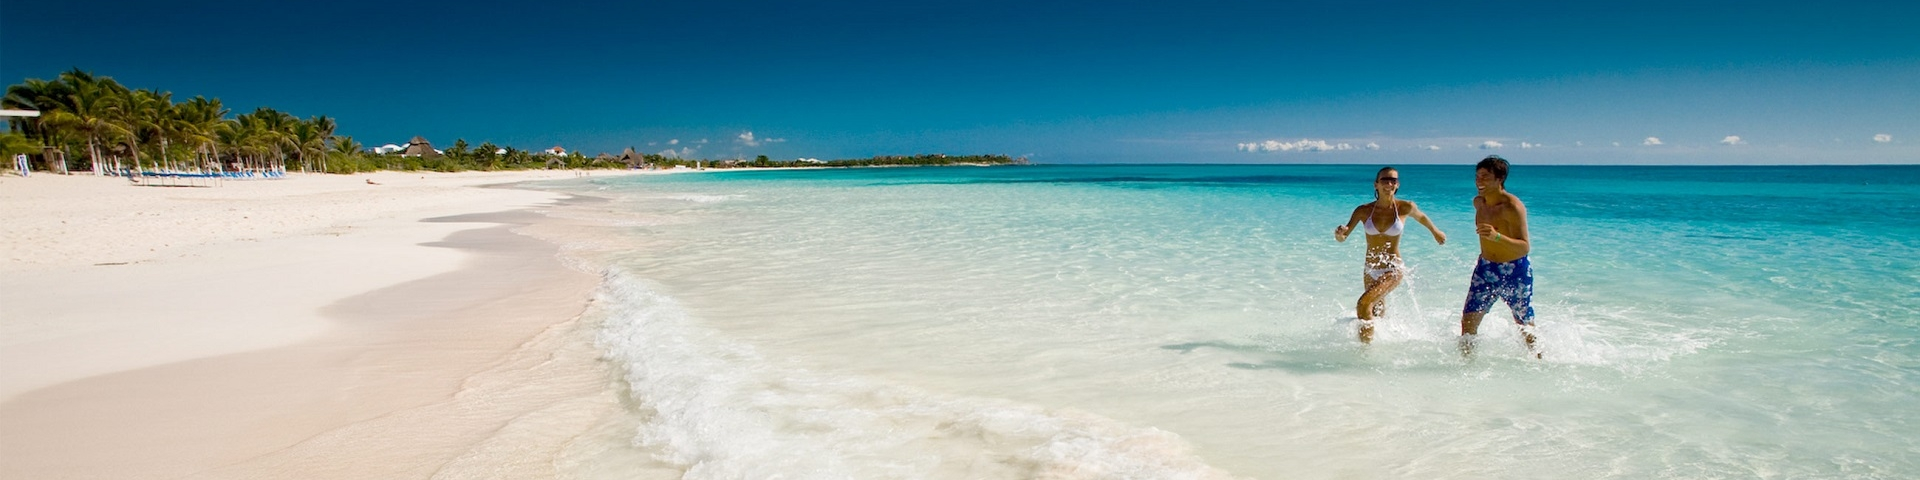 PROMO - Punta Cana & Bayahibe - 09 noches - All Inclusive - *Septiembre y Noviembre*